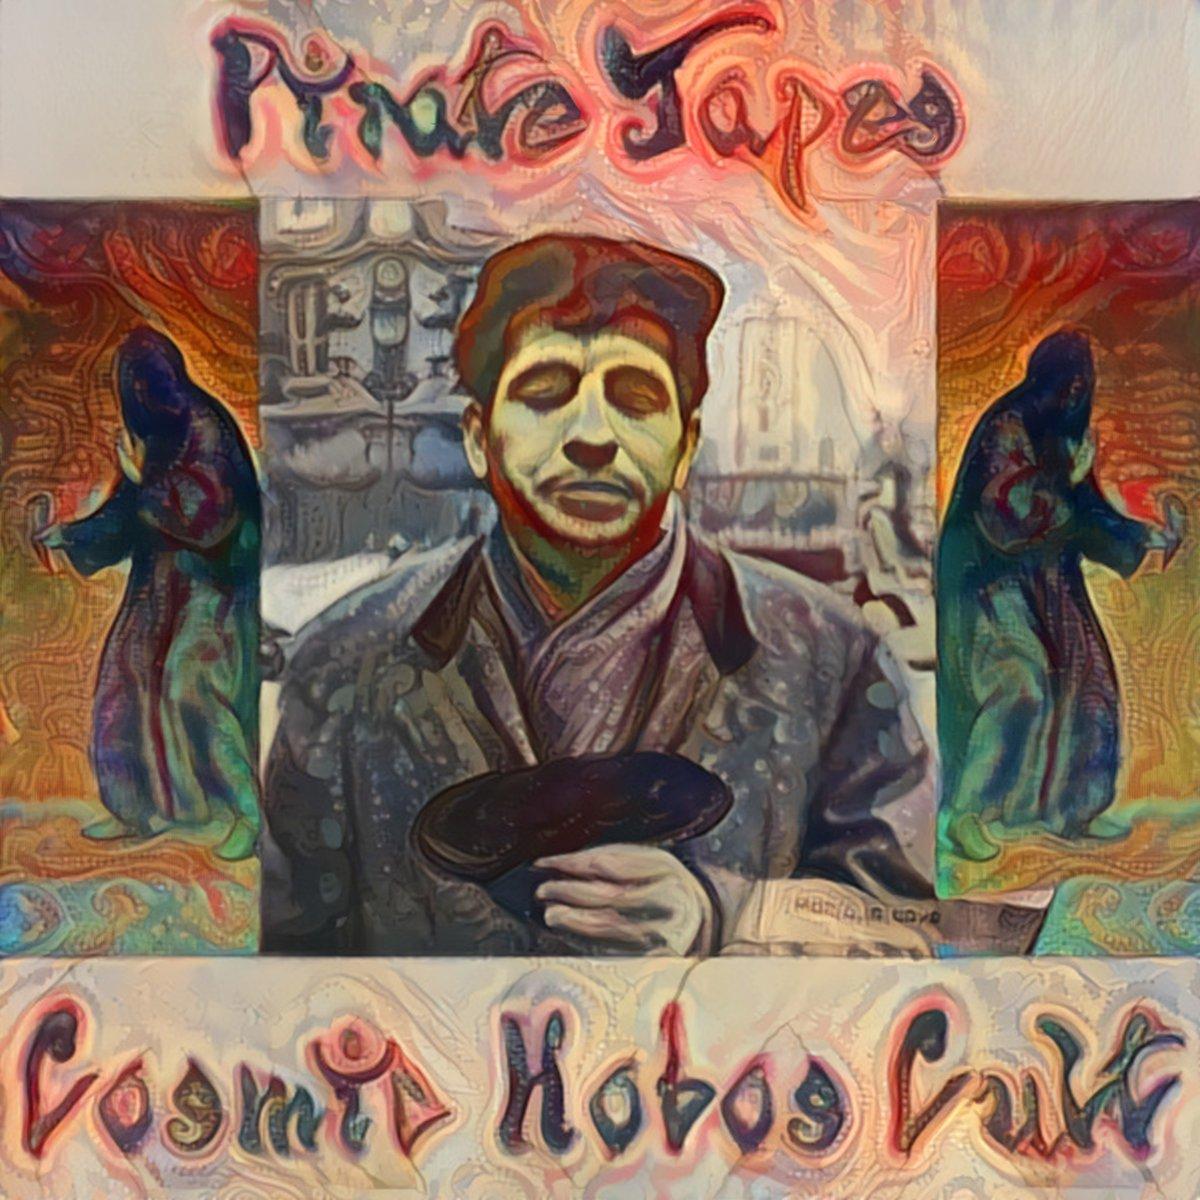 Another page inthelogbookofour #improvised #sound adventures in free download https://t.co/SsZGYfHlVJ #FreeMusic #experimental #blues #industrialmusic #darkjazz #postpunk #postrock #psychedelic #krautrock #beatgeneration #kerouac #busker #underground #avantgarde #creativecommons https://t.co/qkBT4nNoZt